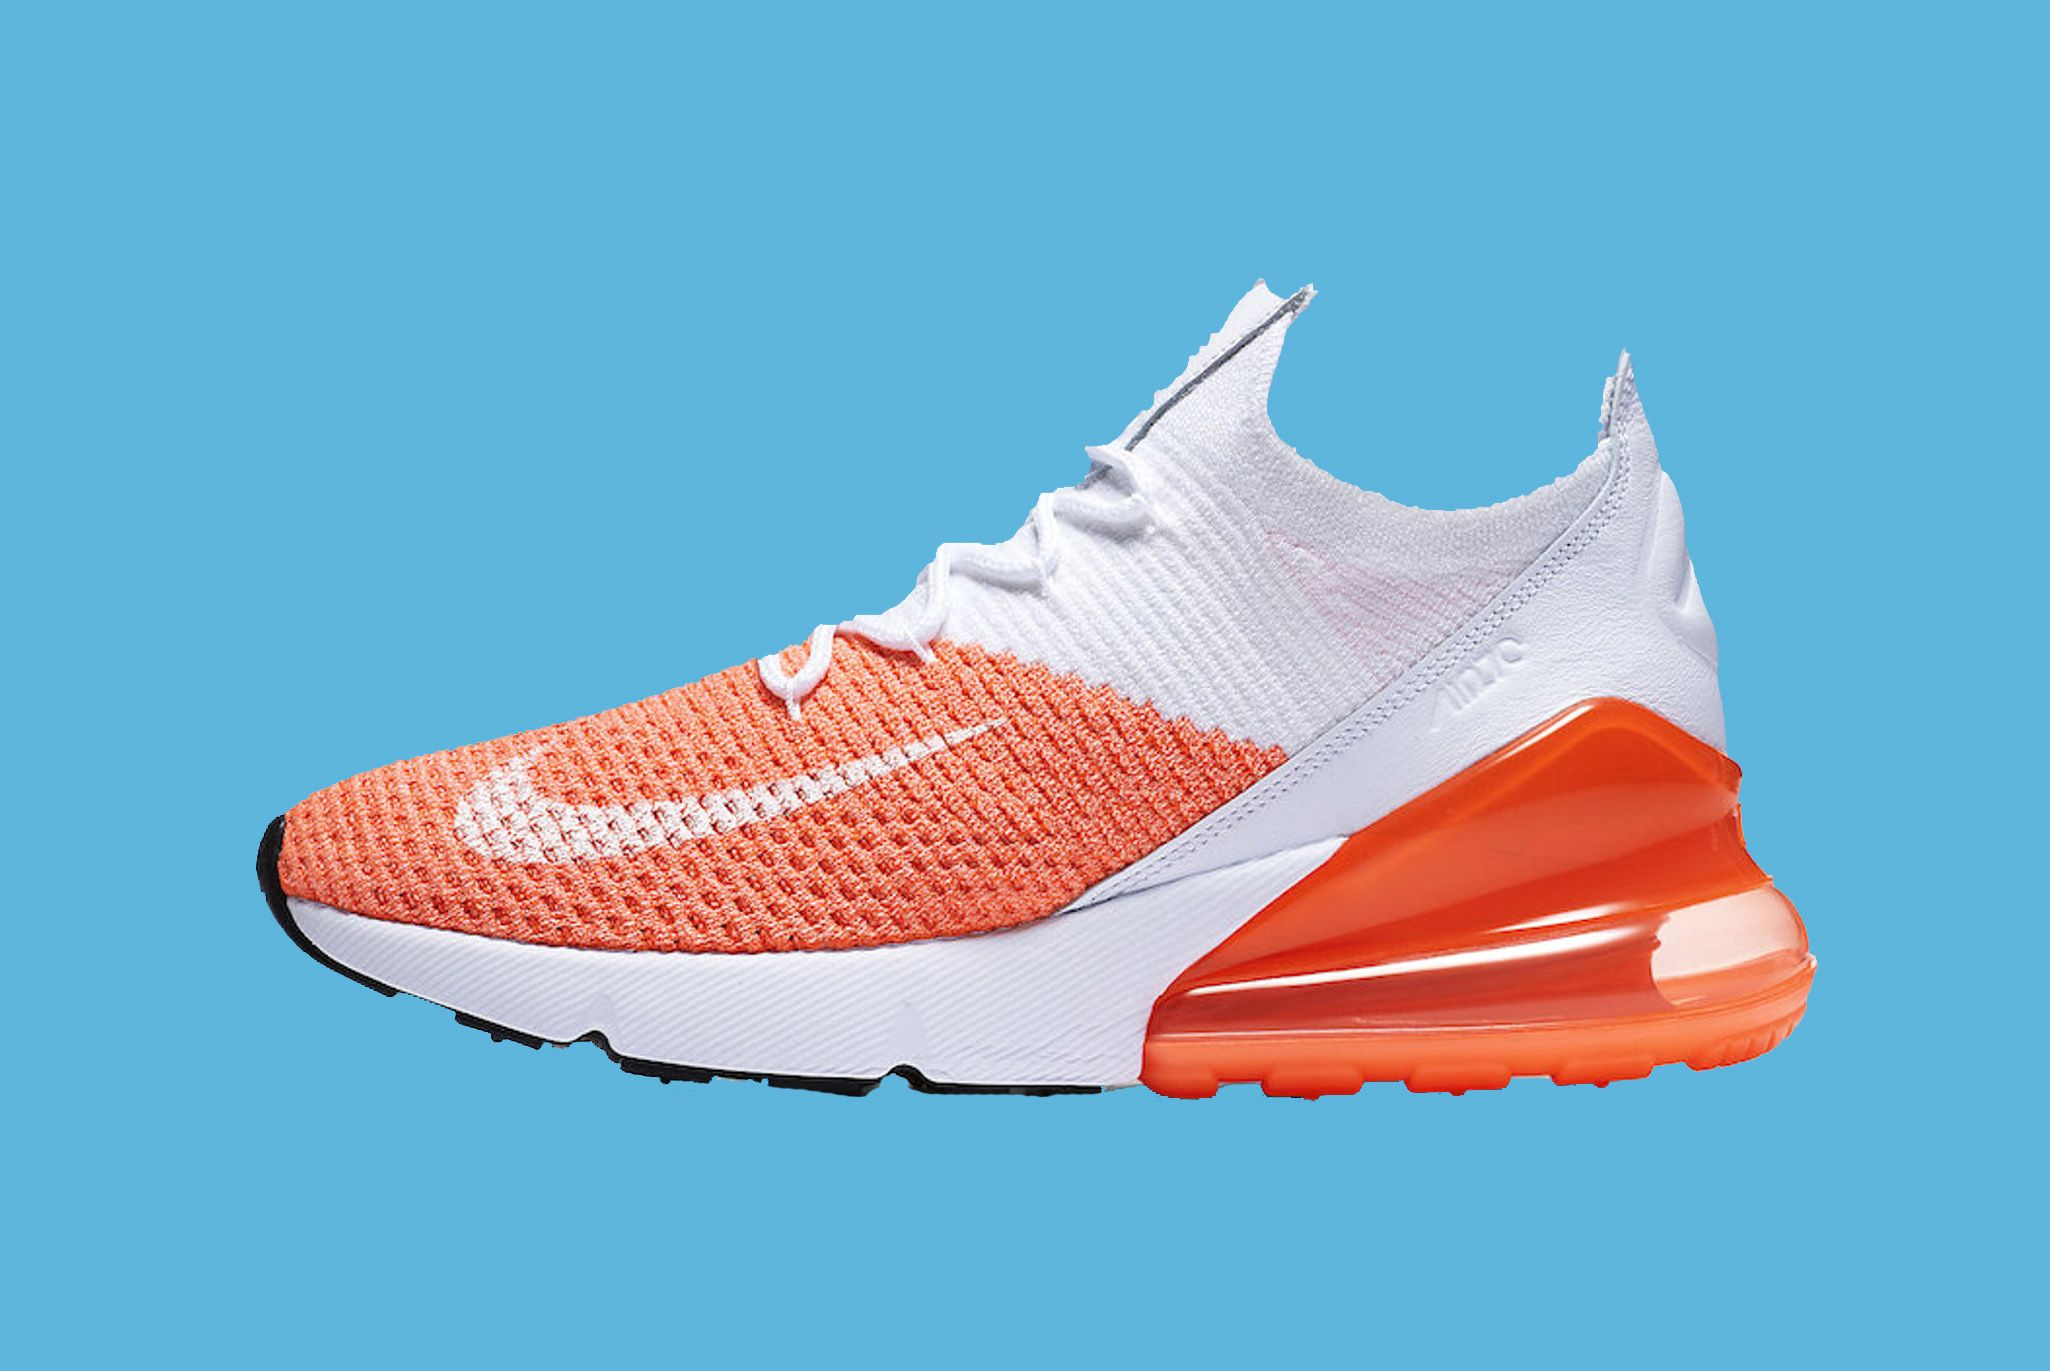 Nike Air Max 270 Flyknit Crimson Pulse 1 Sneaker Freaker